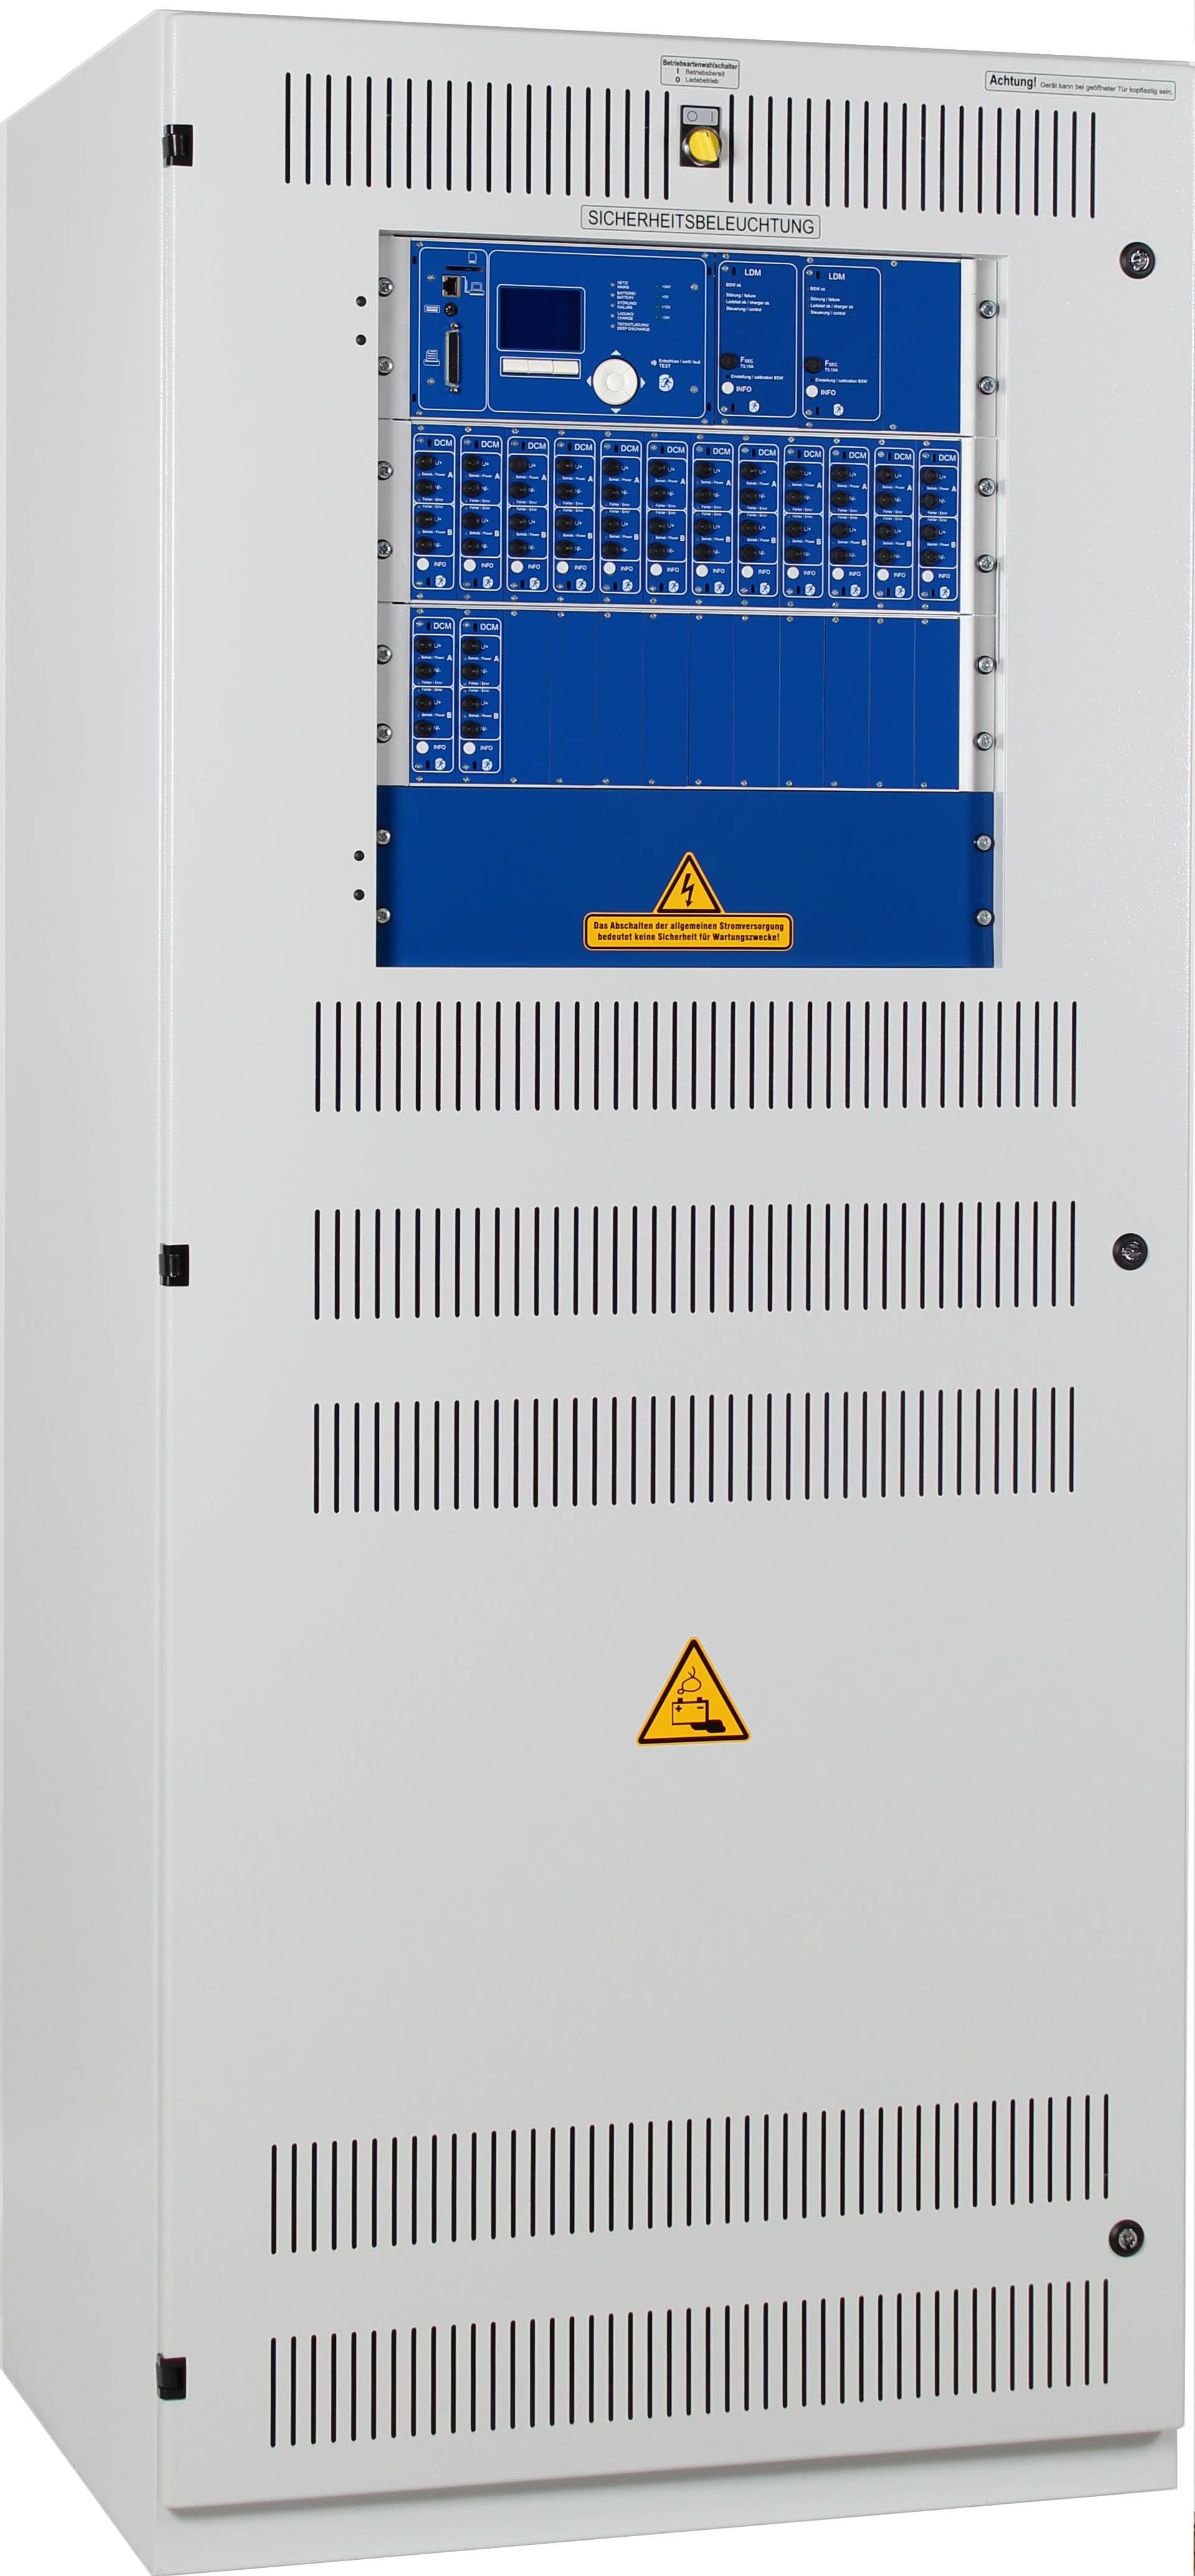 1 Stk Zentralbatterieanlage MaxiControl 48/5A, ohne DCM NLMCX248--